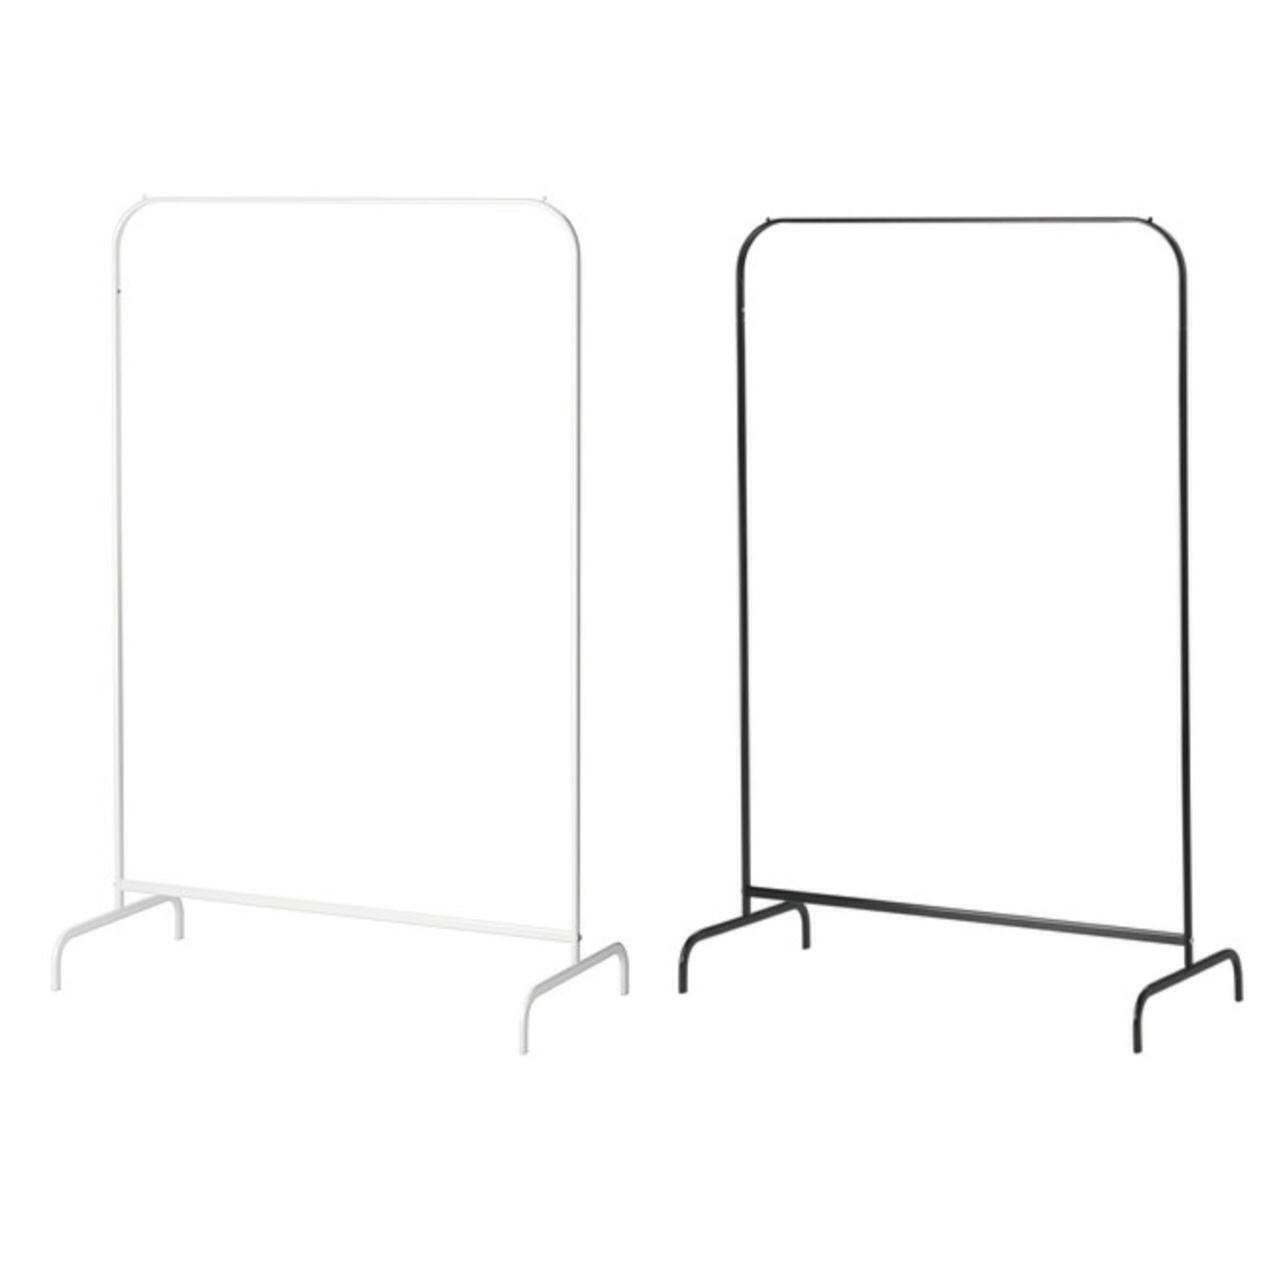 jual ikea mulig rak pakaian our warehouse tokopedia. Black Bedroom Furniture Sets. Home Design Ideas